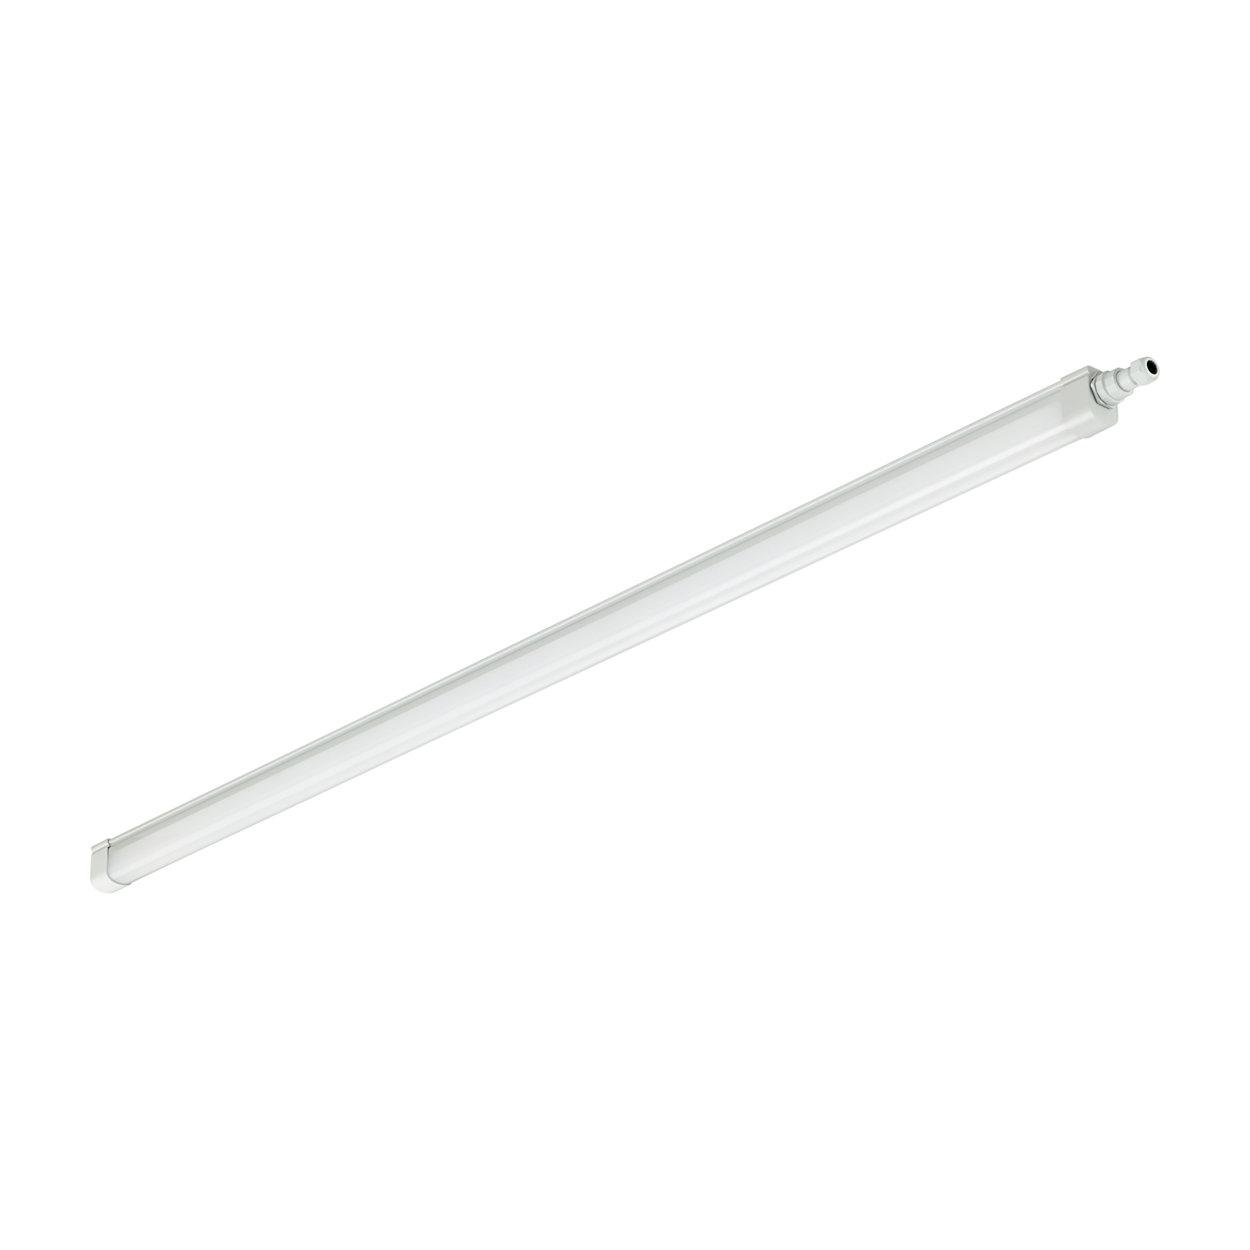 LEDINAIRE - eine einfachefunktionale LED-Leuchte